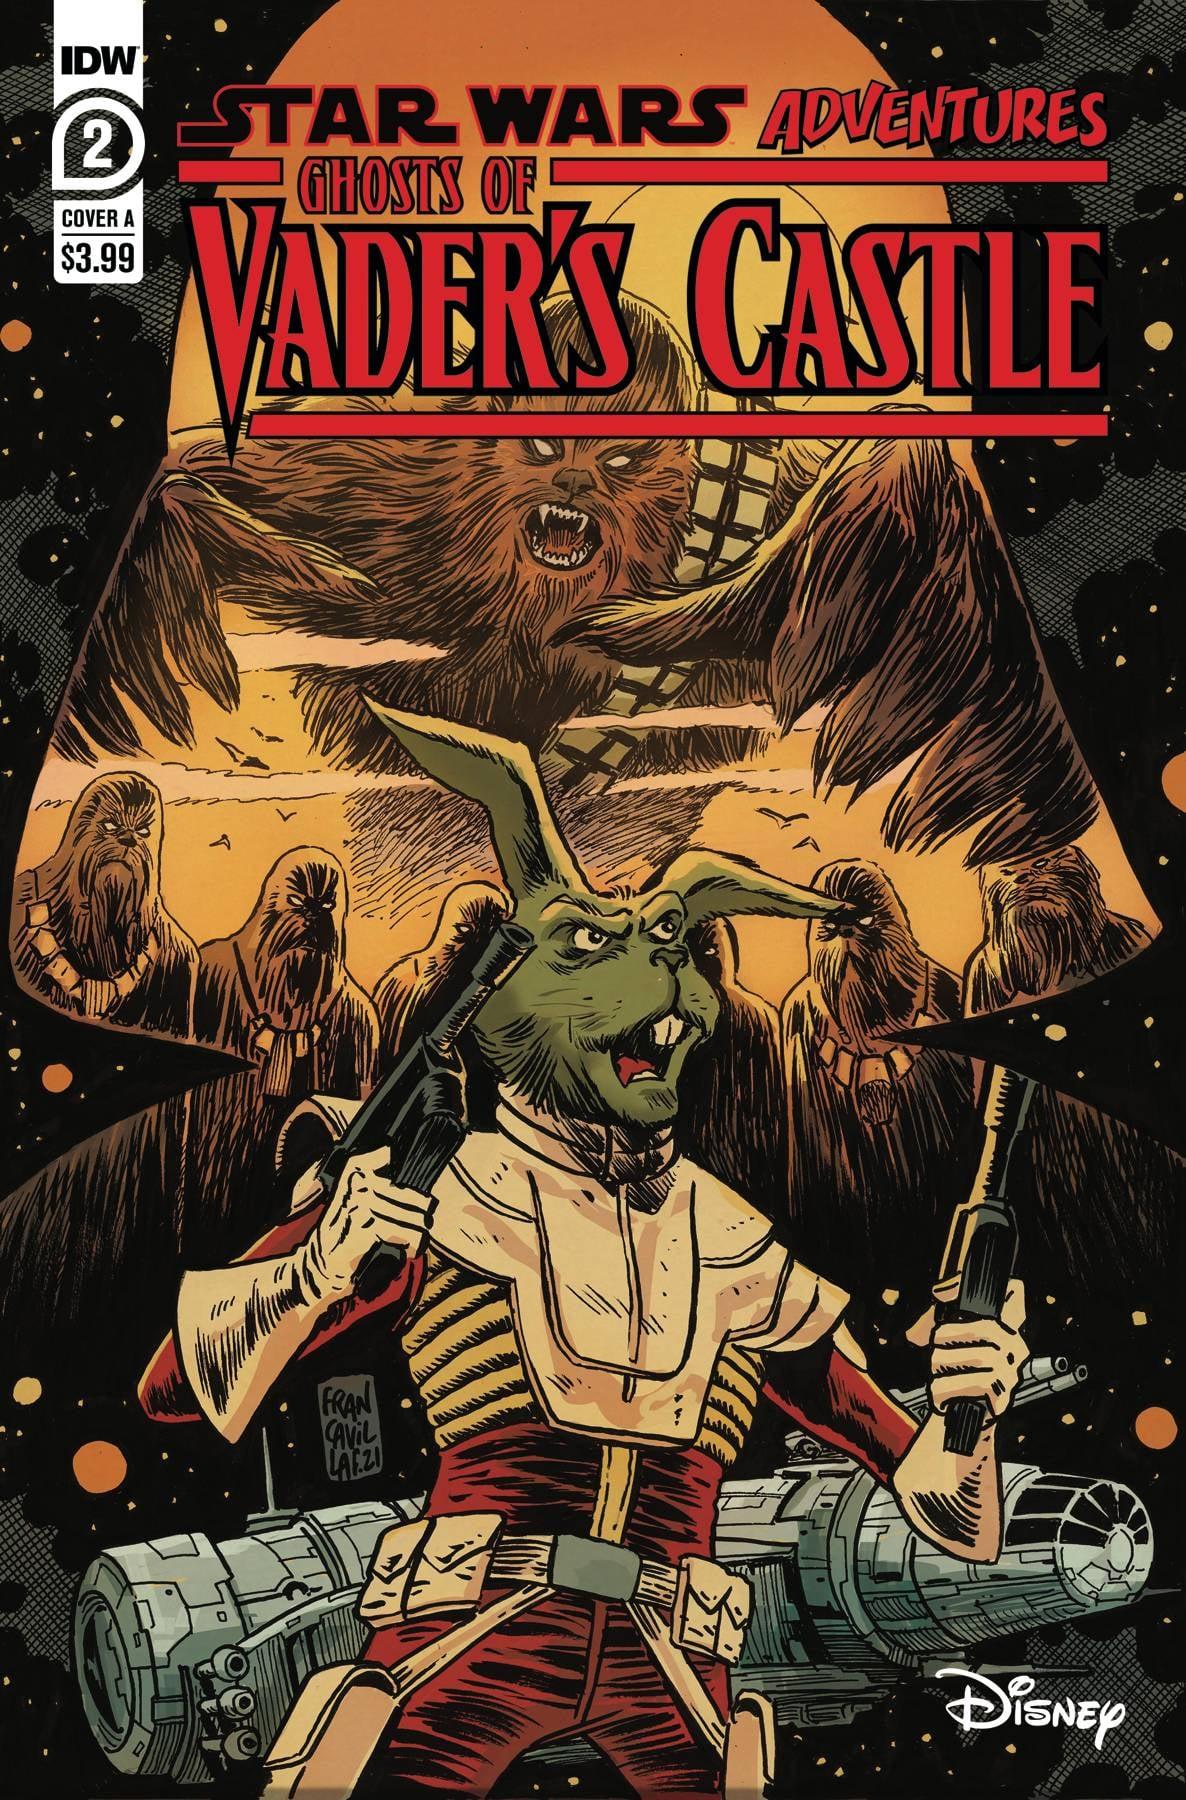 Star Wars Adventures: Ghosts of Vader's Castle 2